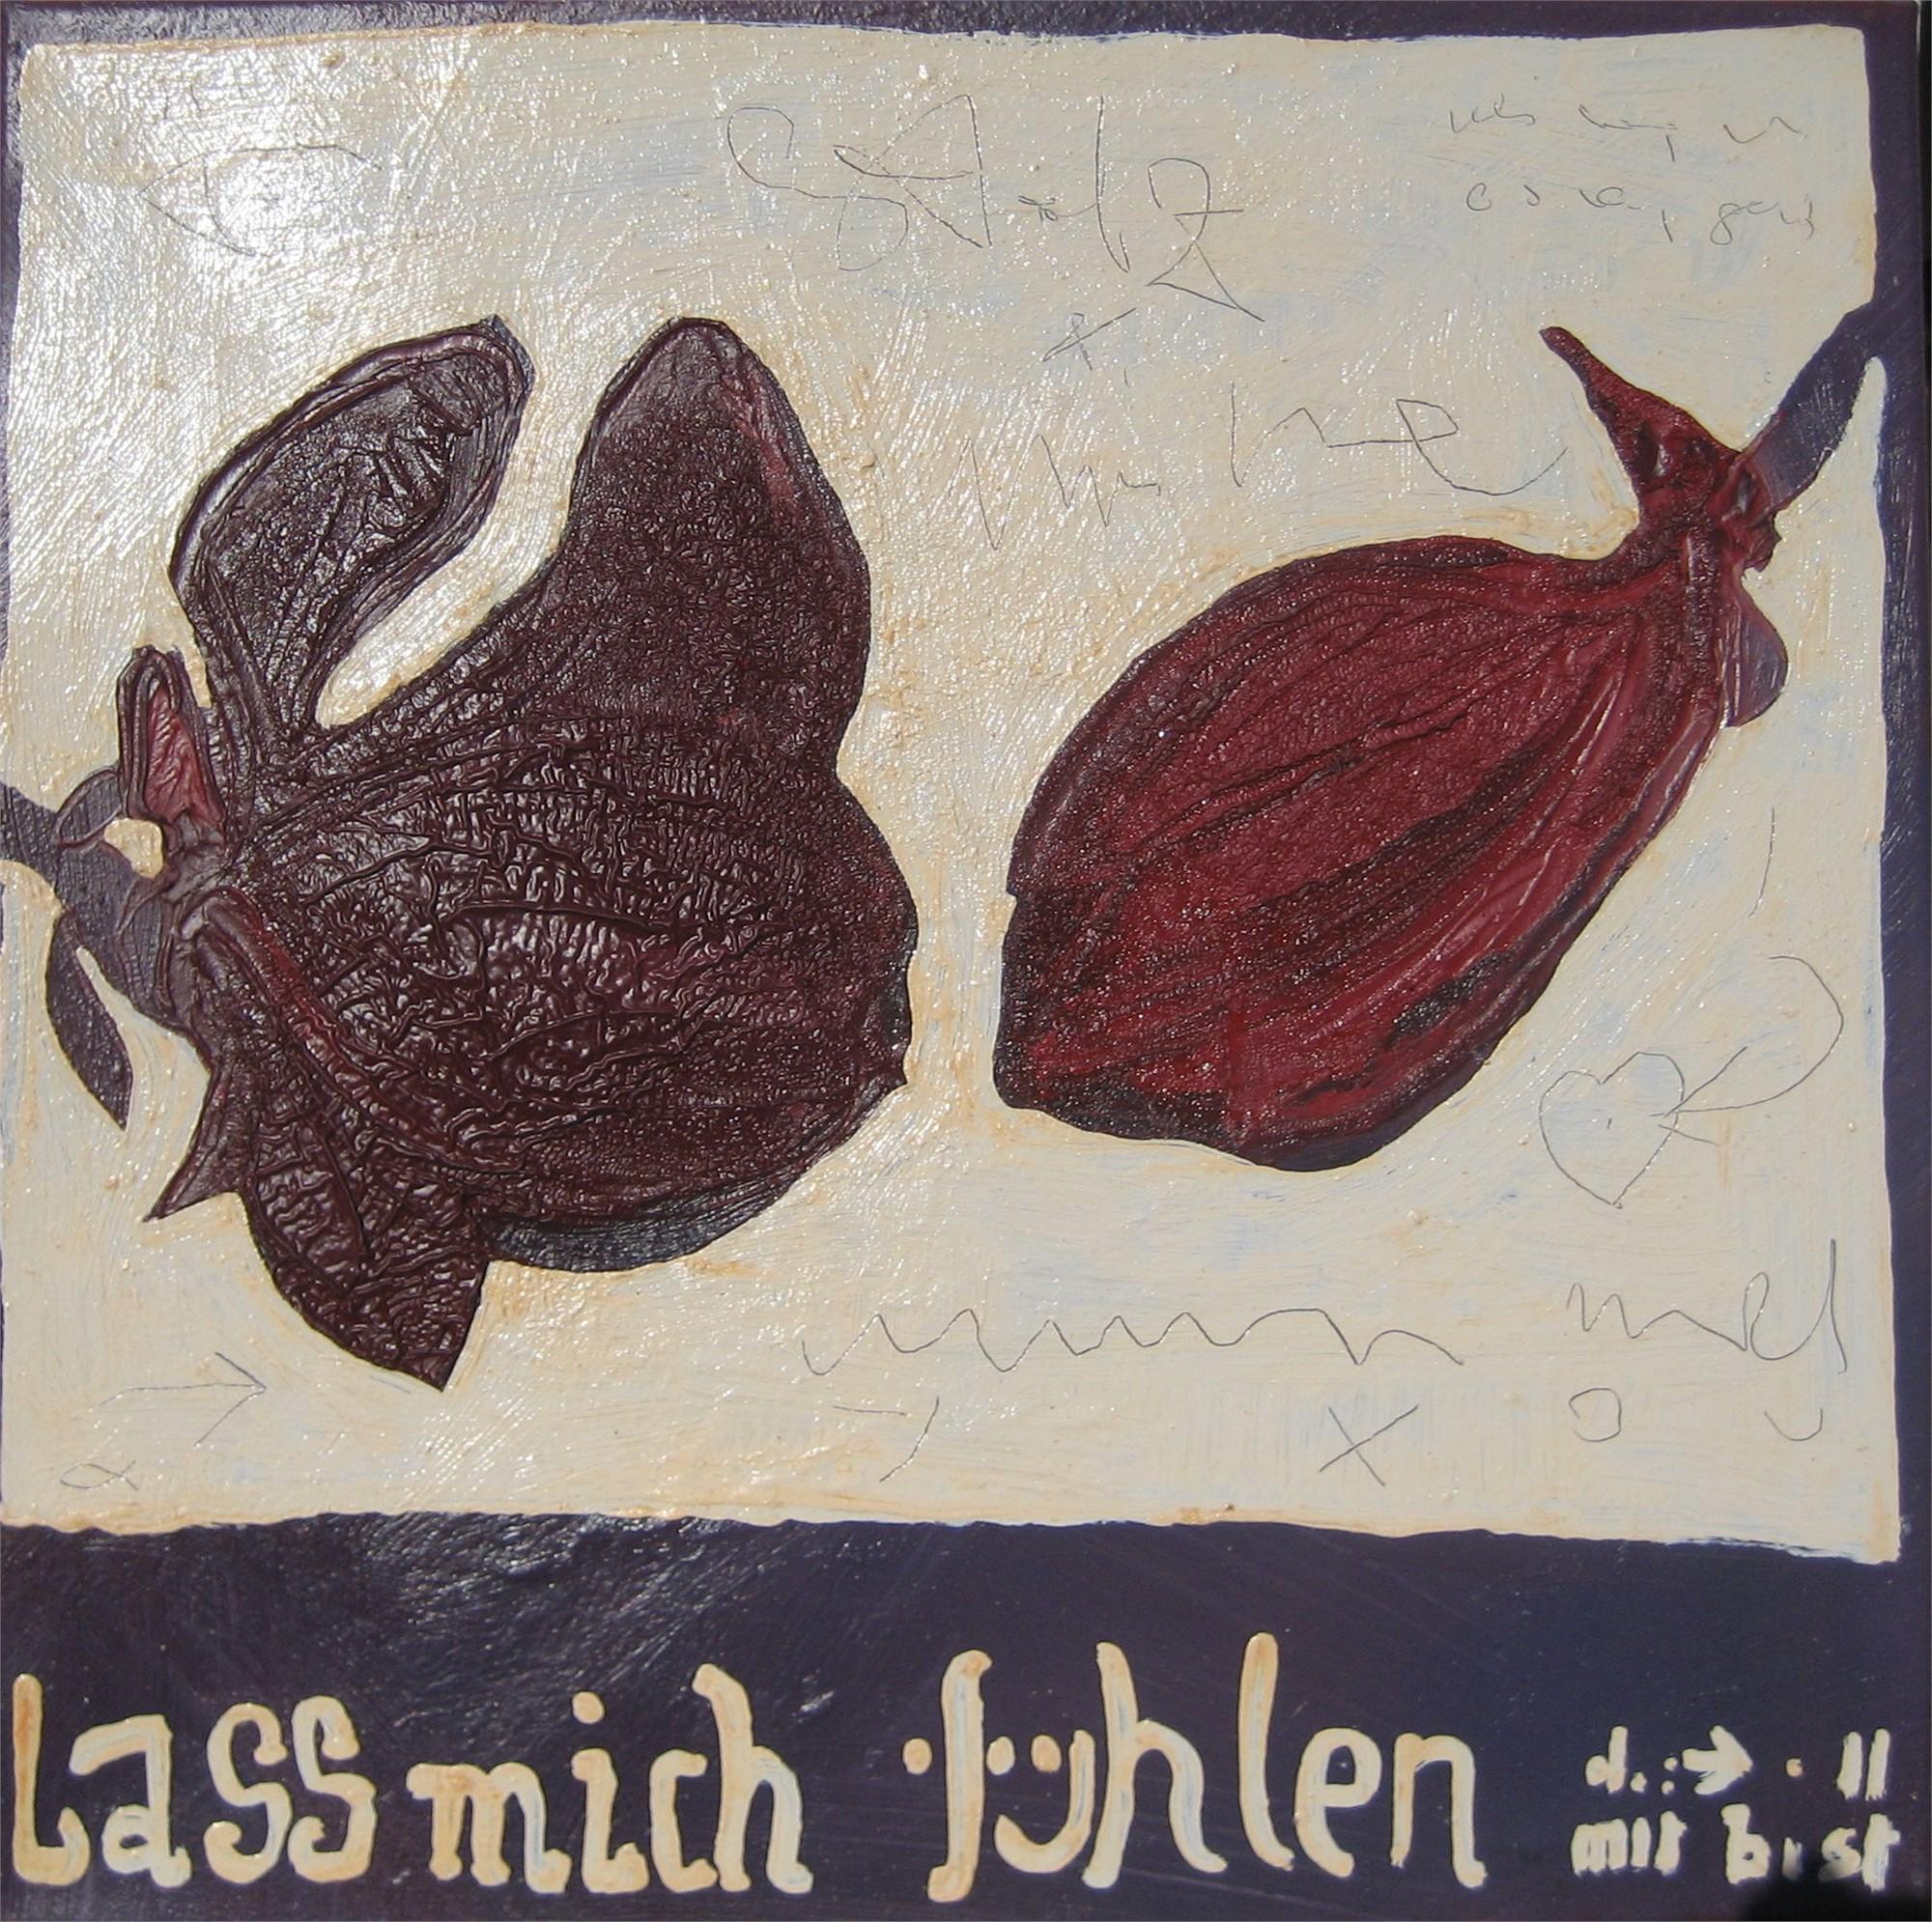 Lass Mich Fuehlen by Hans Joerg Fuerpass